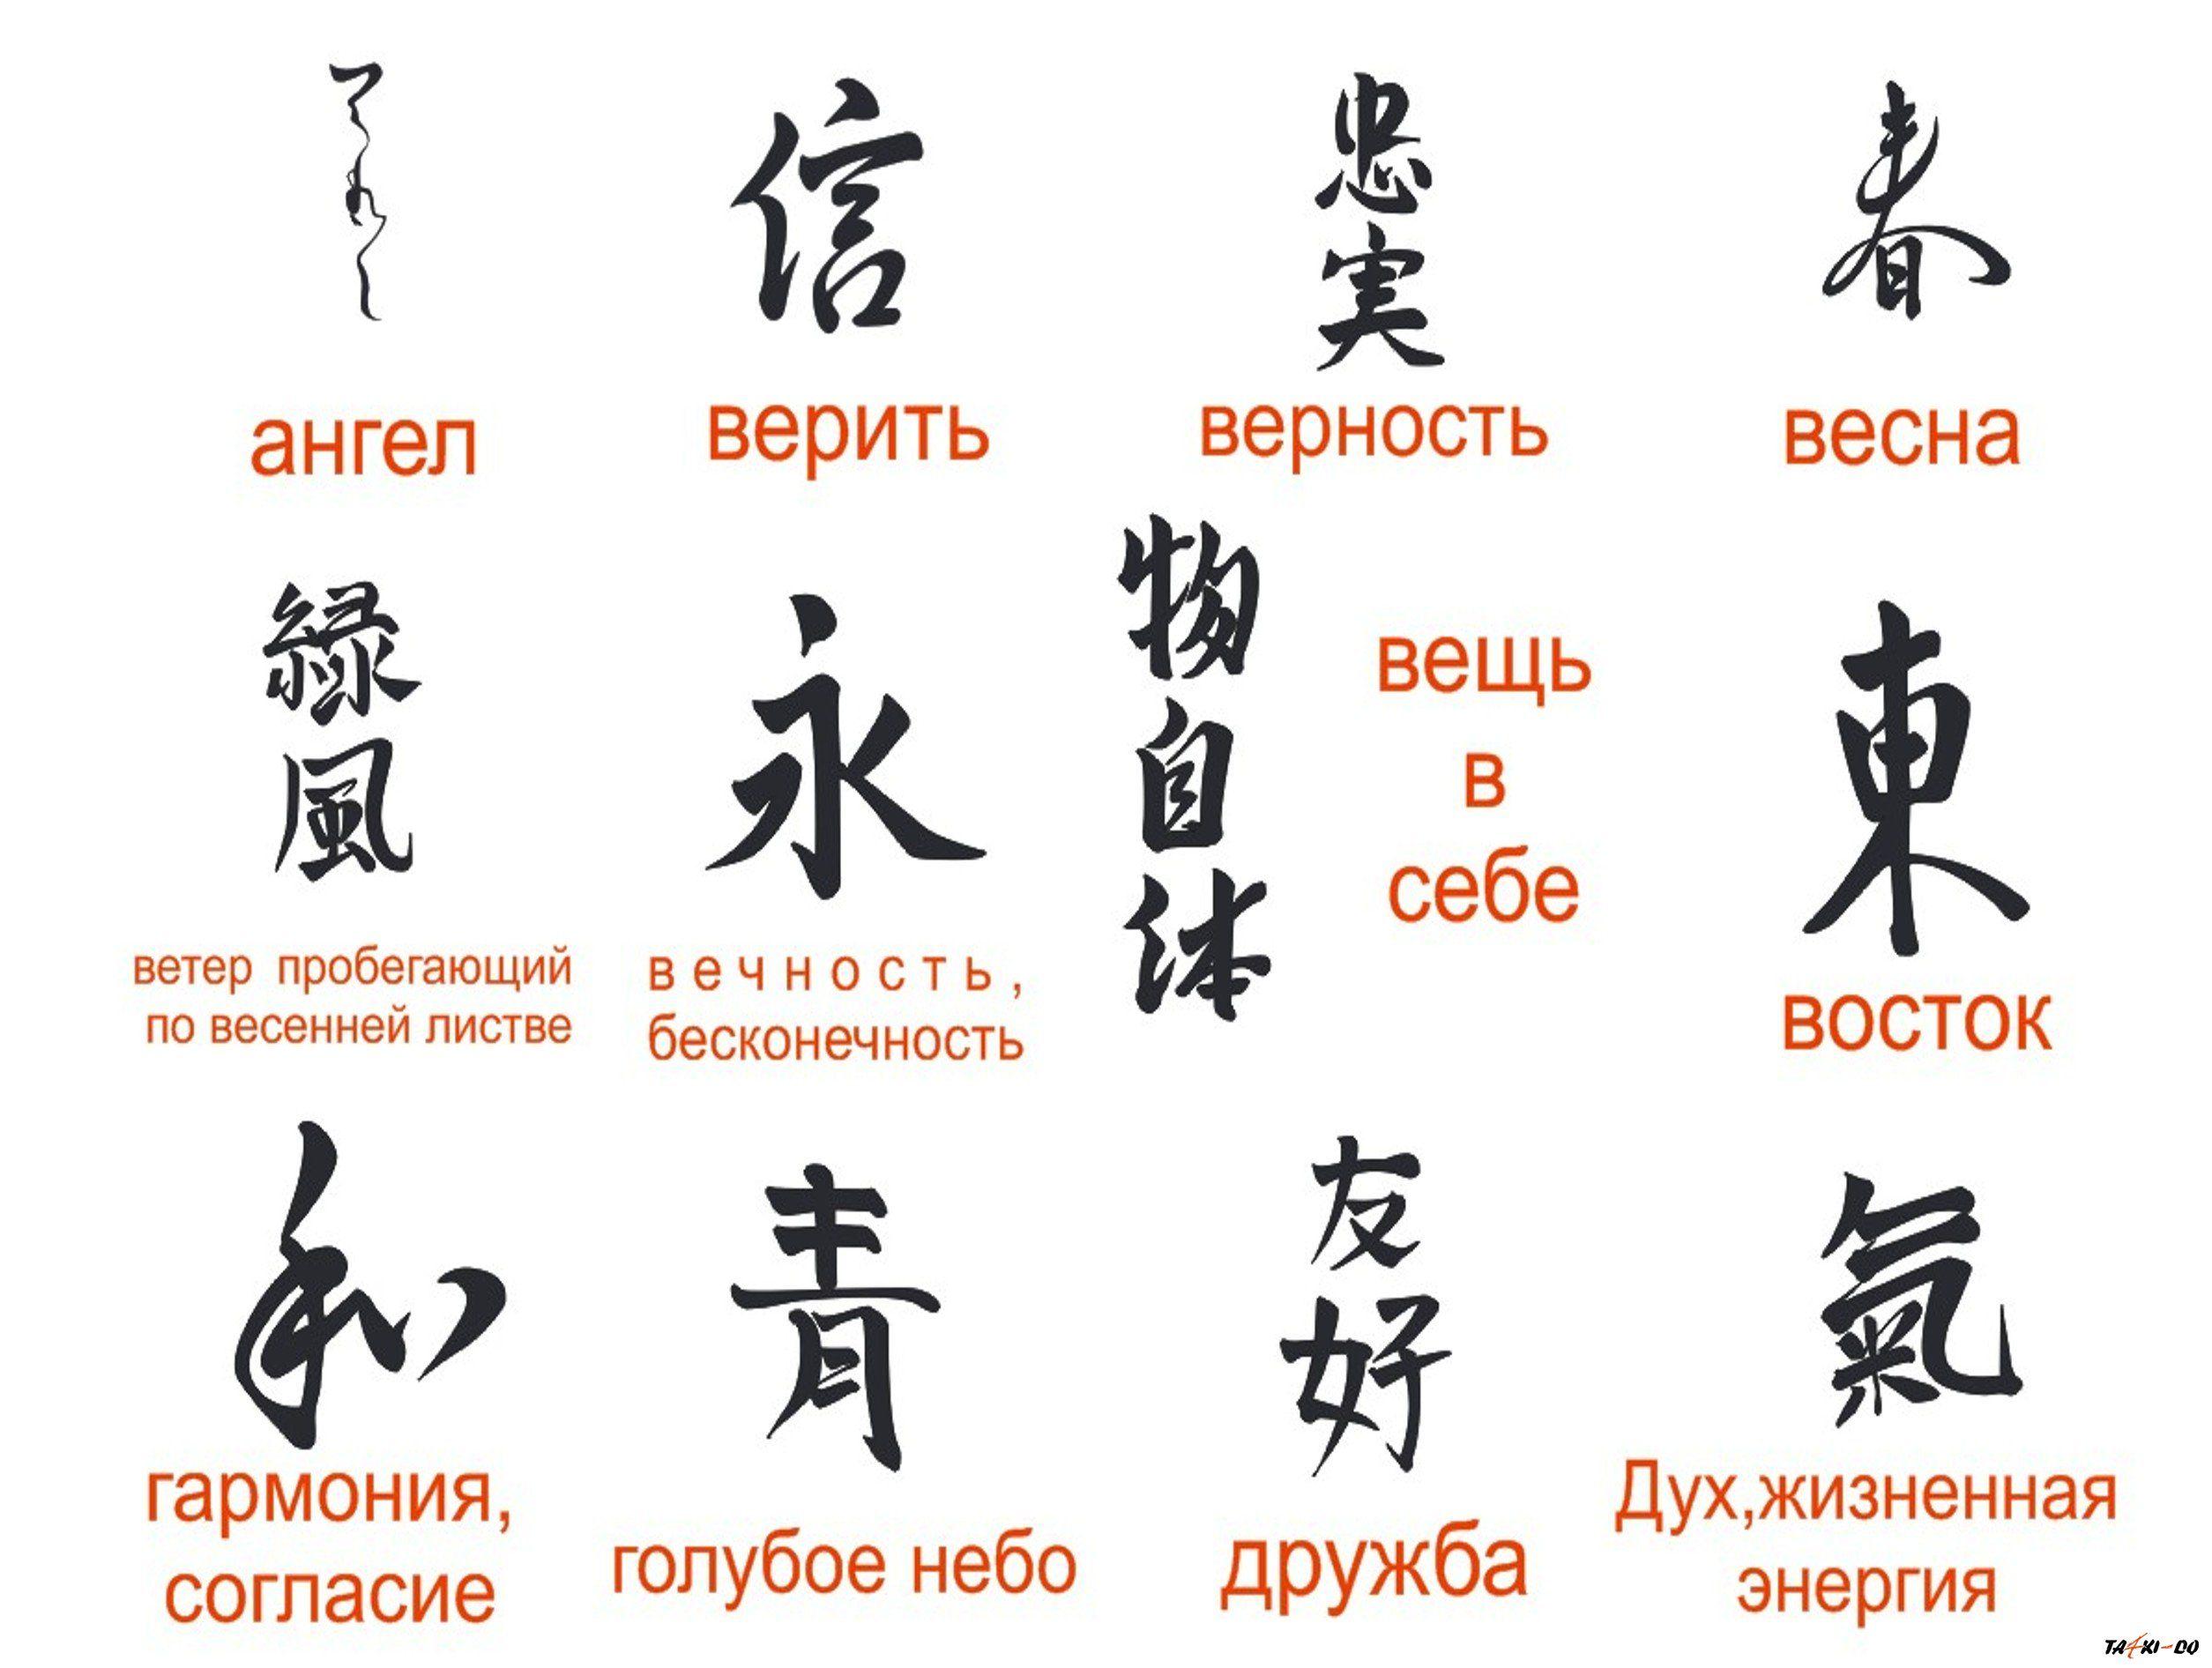 Юбилеем, картинки тату надписи с обозначениями